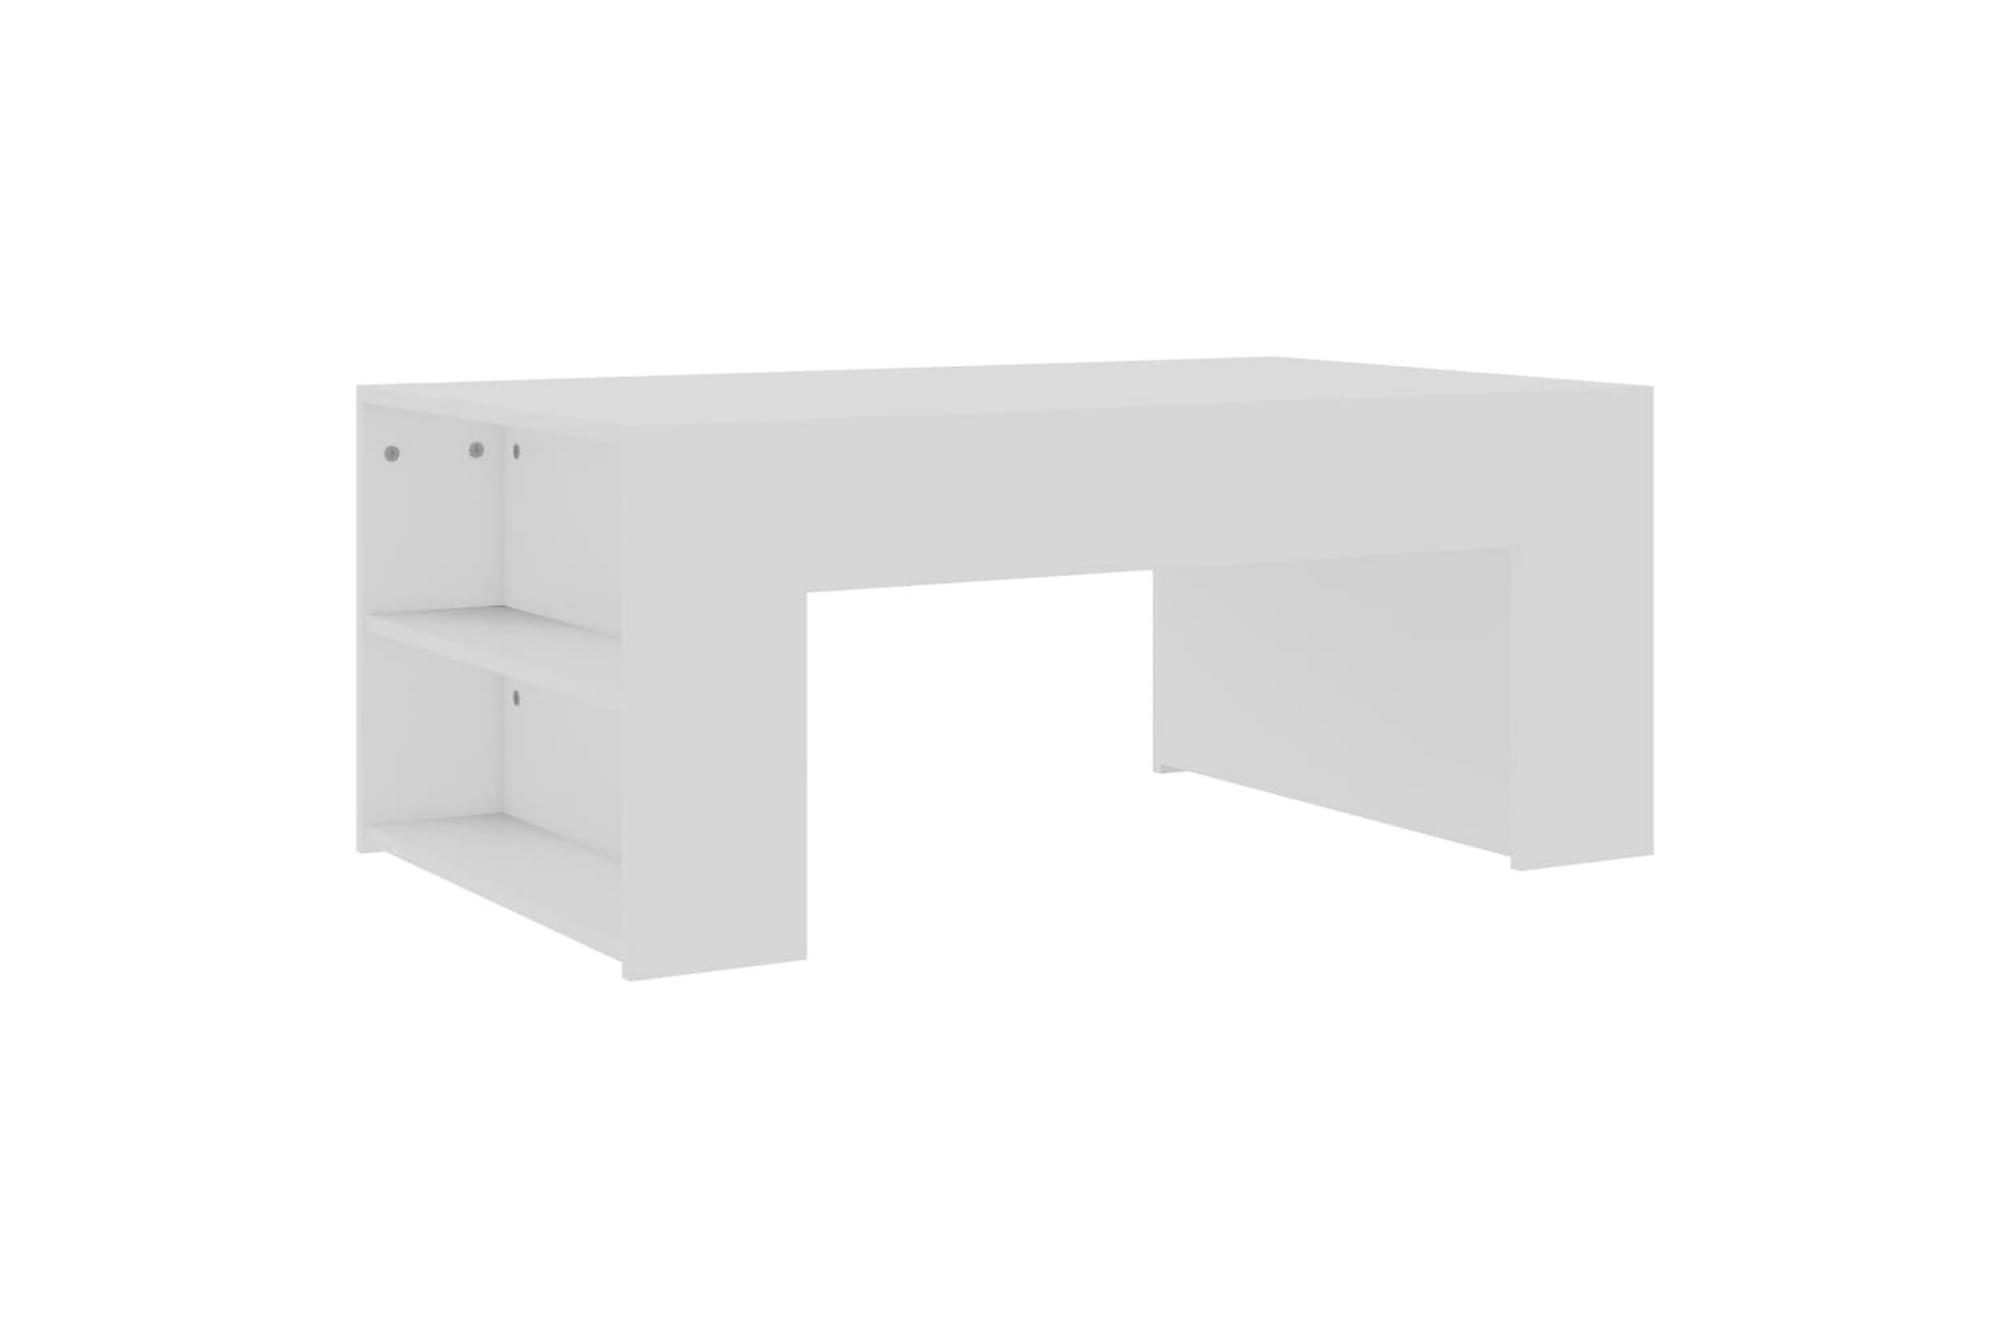 Soffbord vit 100x60x42 cm spånskiva